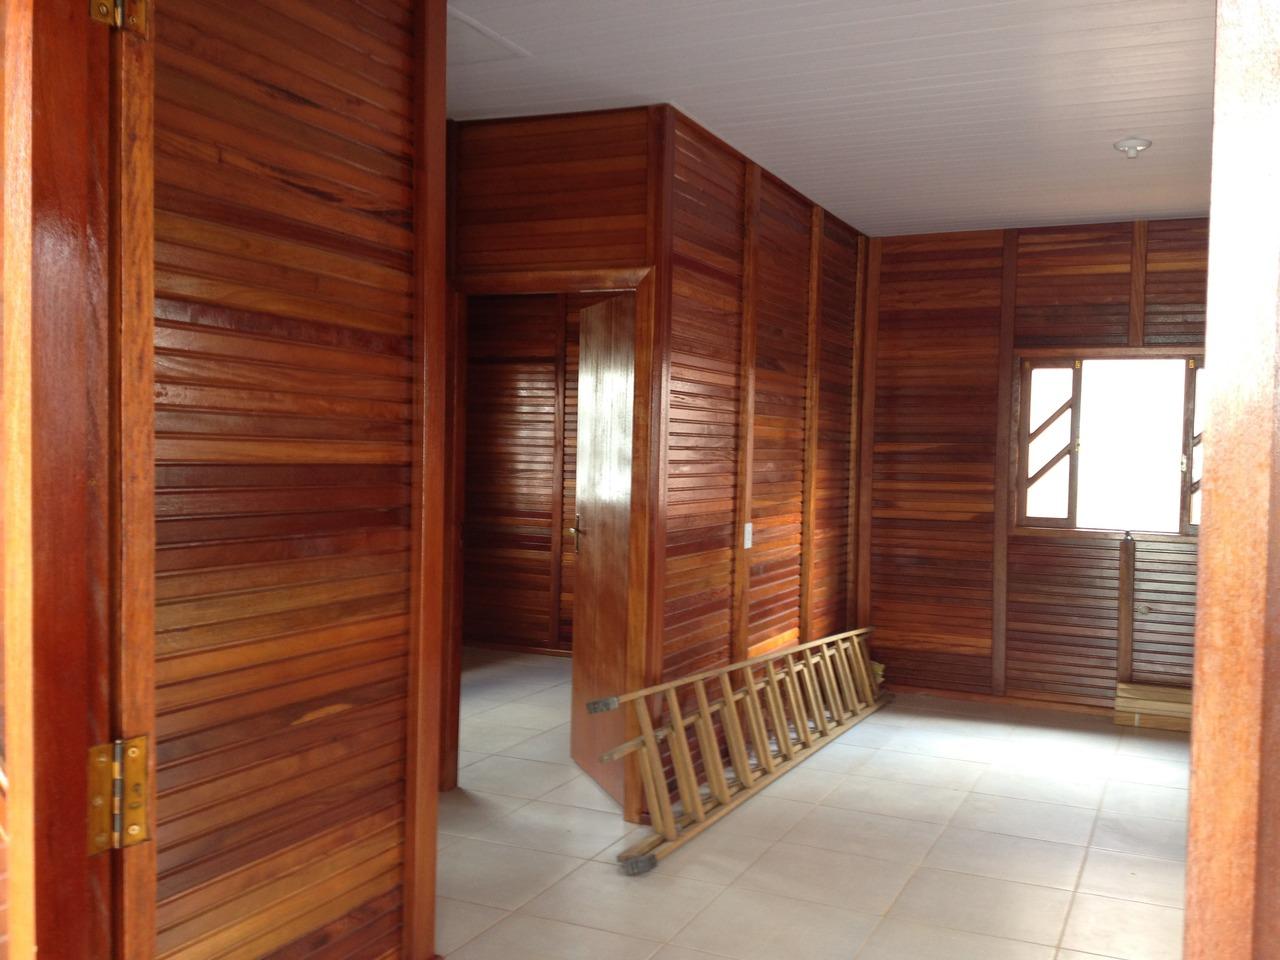 Interiores e acabamentos  Habitare Casas de Madeira